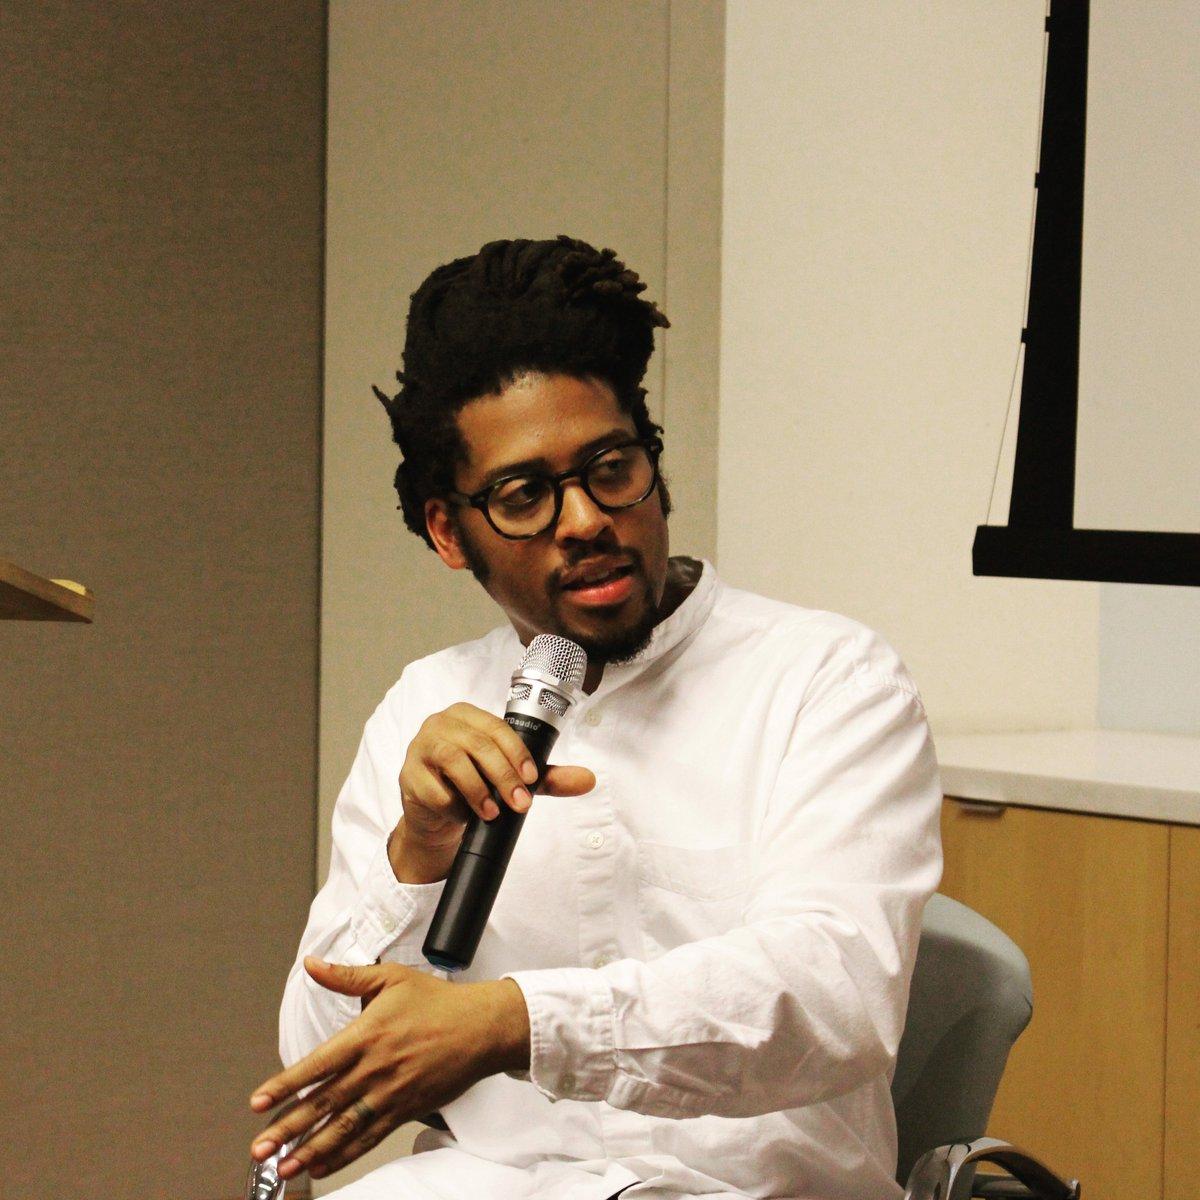 A delightful talk with @BlackGotham&#39;s Kamau Ware, exploring the hidden history of black diaspora in New York. #insideBlackGotham #humanities <br>http://pic.twitter.com/Xsyoxr1dkG